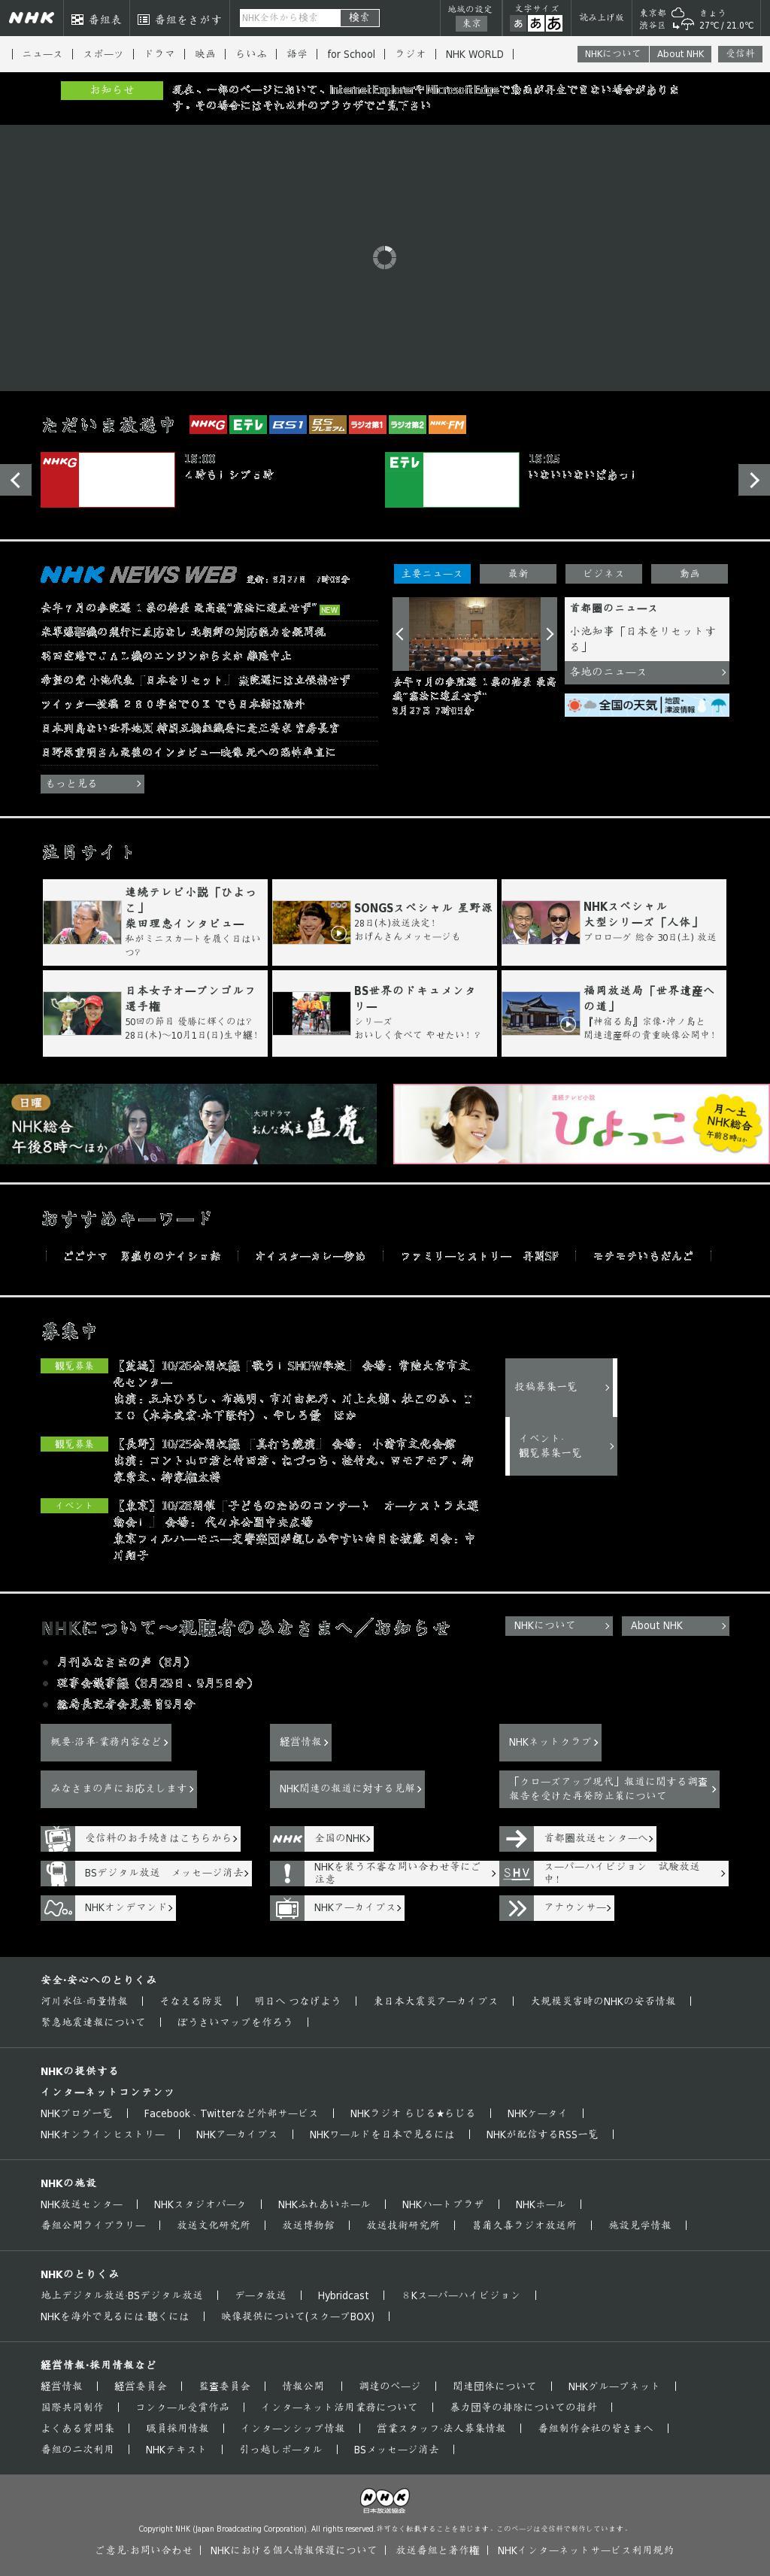 NHK Online at Wednesday Sept. 27, 2017, 7:13 a.m. UTC